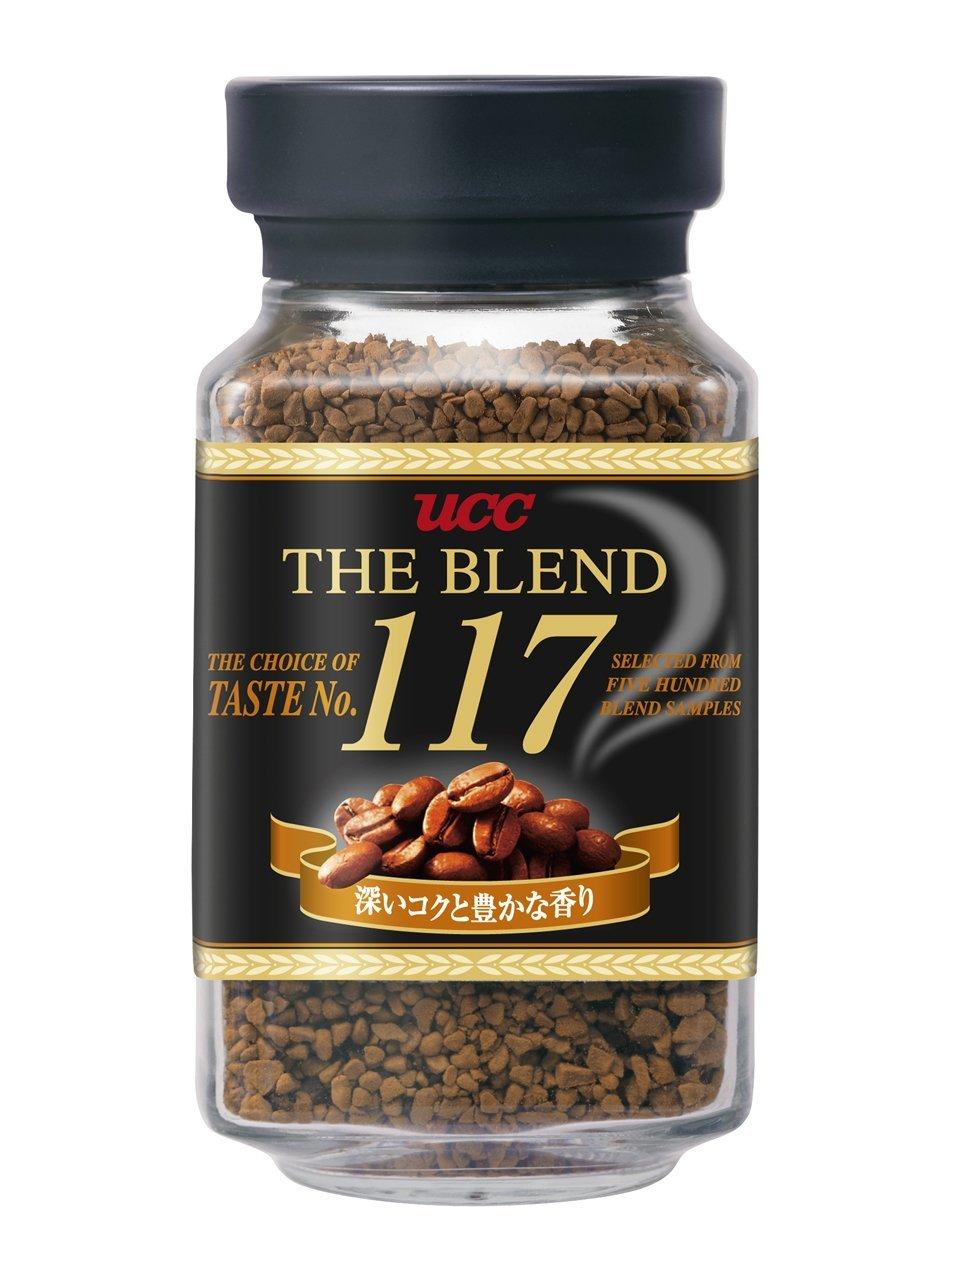 《Chara 微百貨》 日本 UCC 經典 the blend 114 117 即溶 咖啡罐 90g 原裝進口 2